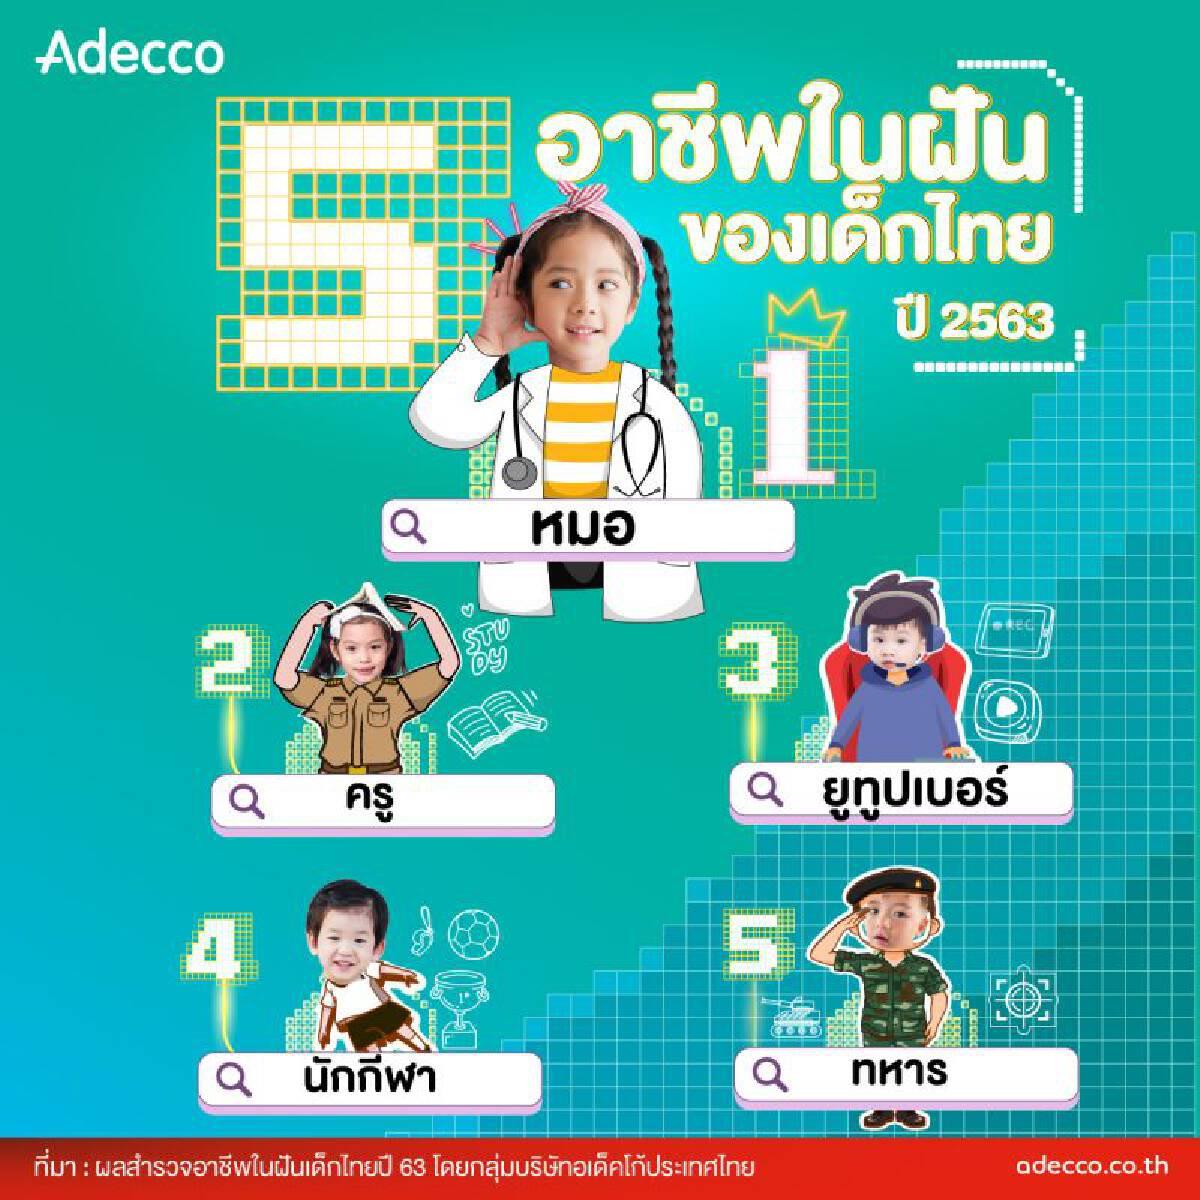 Youtube สื่อทรงอิทธิพลเด็กไทย